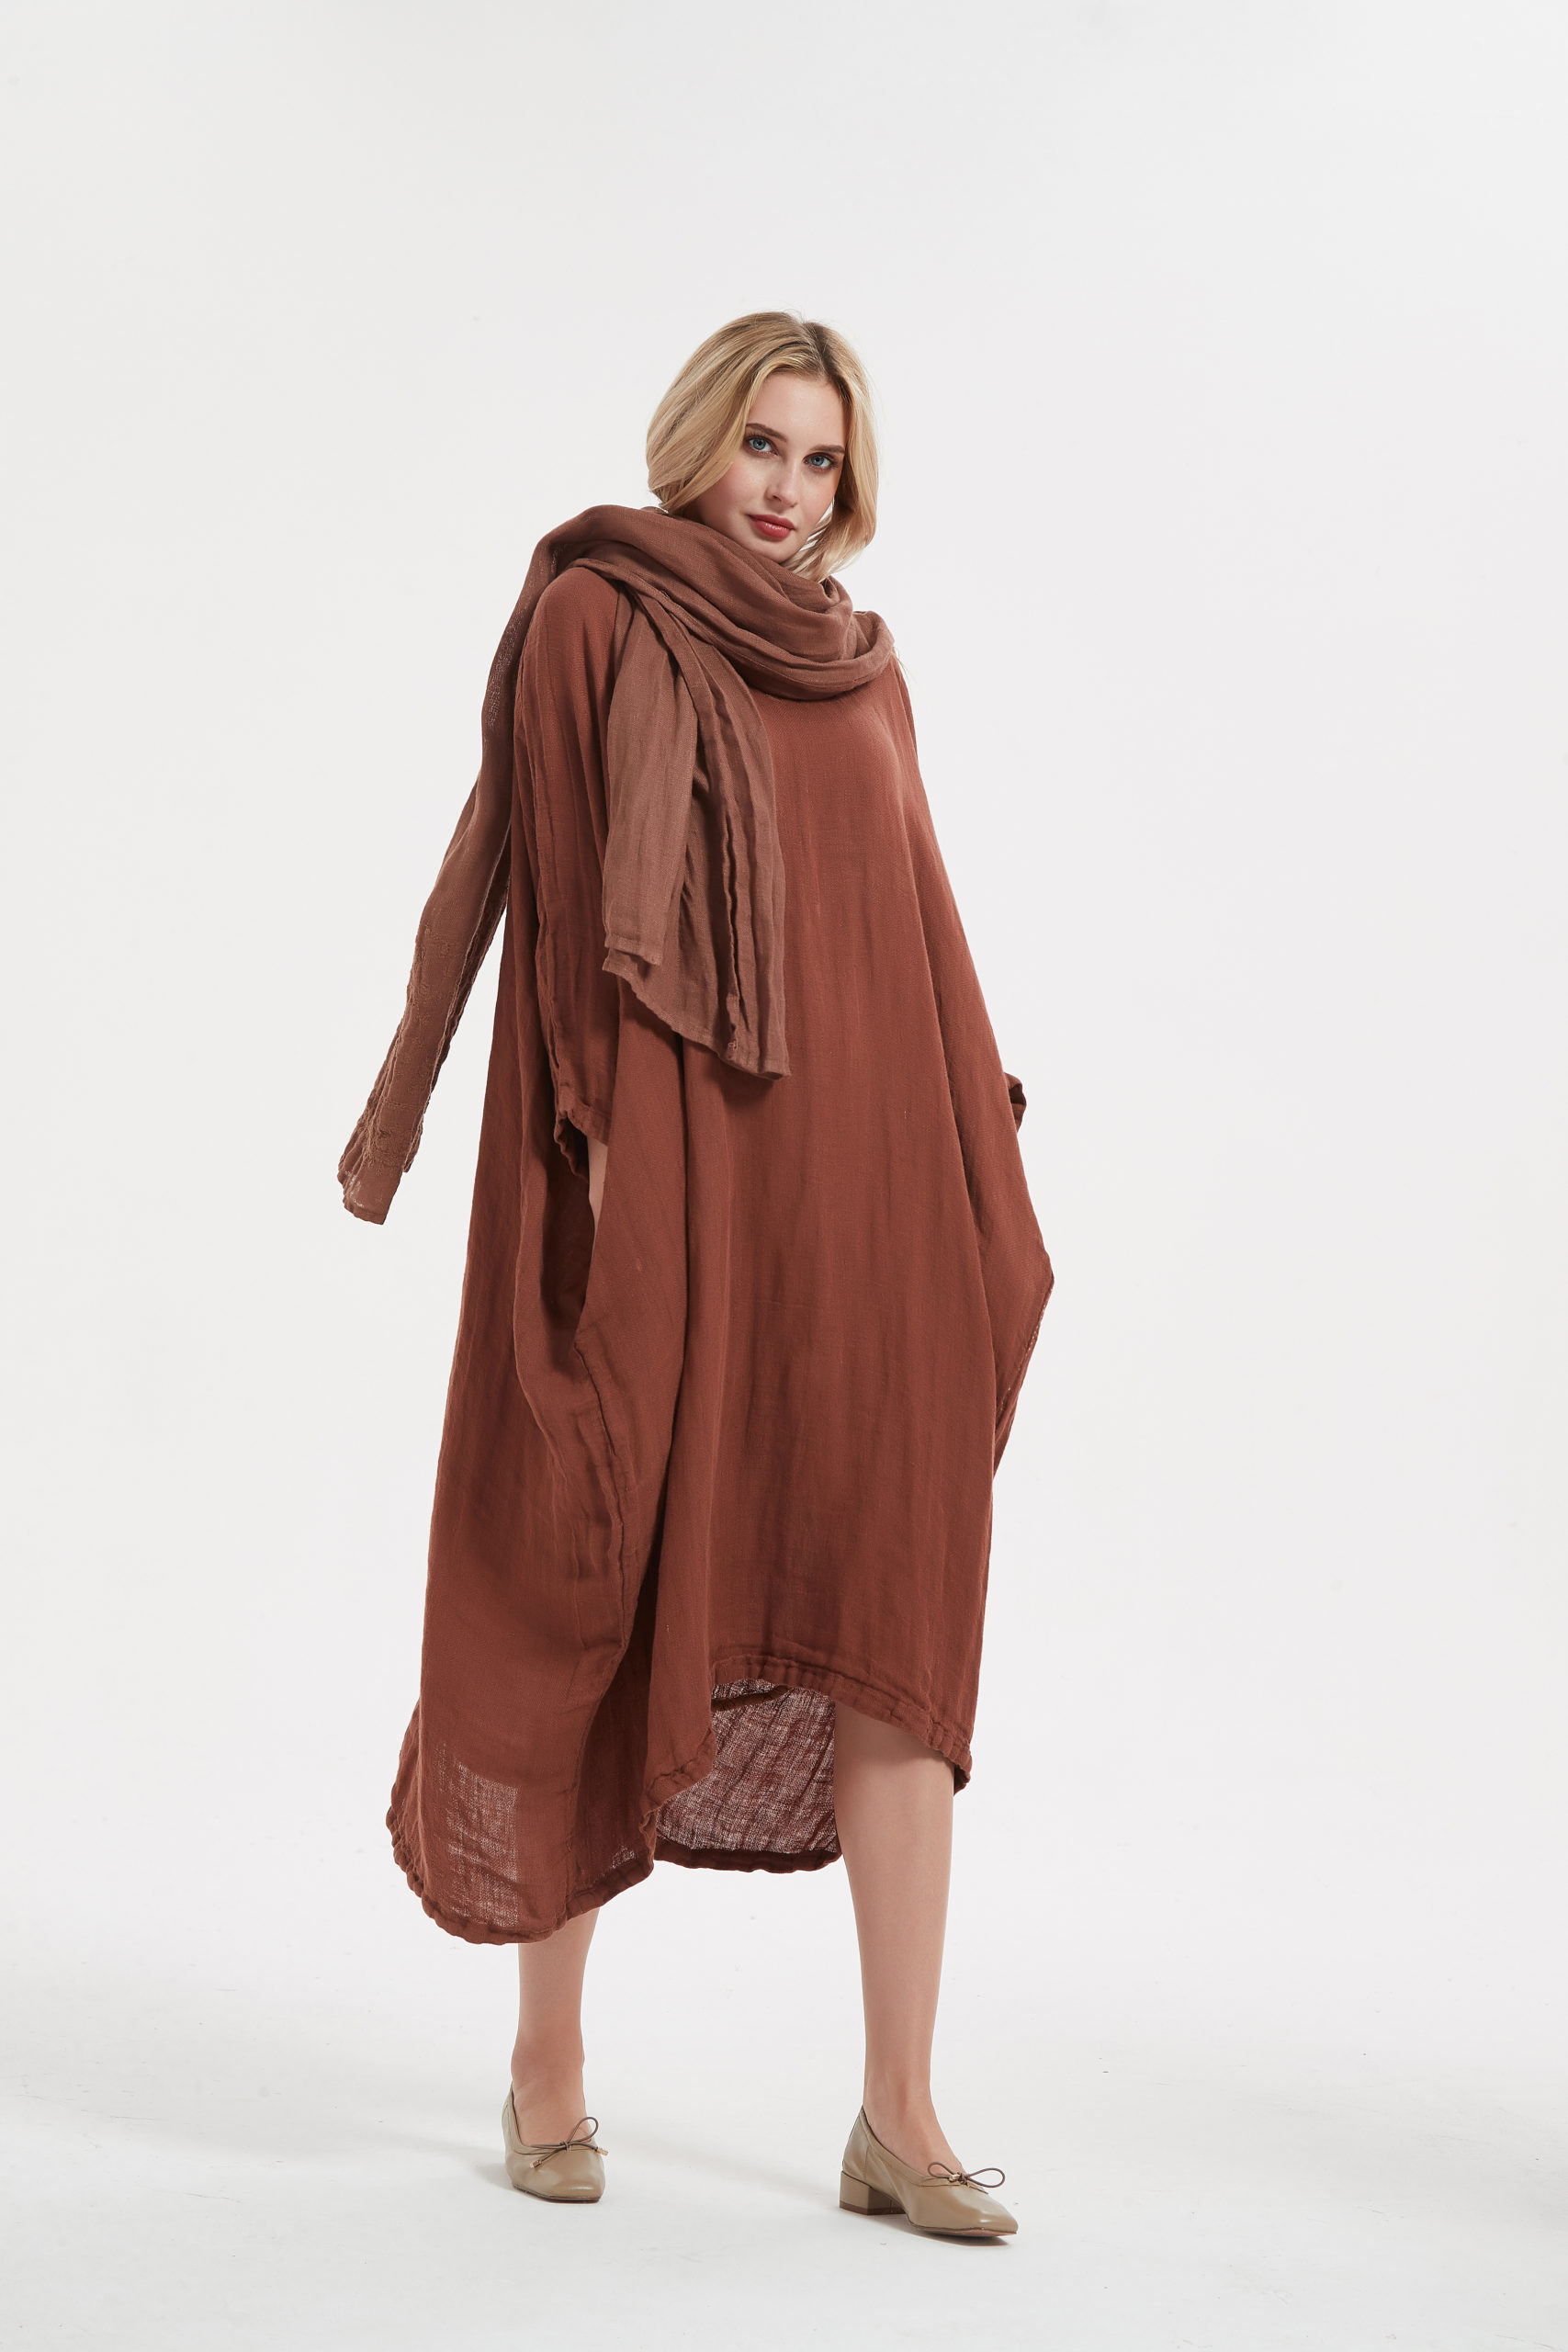 7 Ideas To Style Linen Dress Elegantly